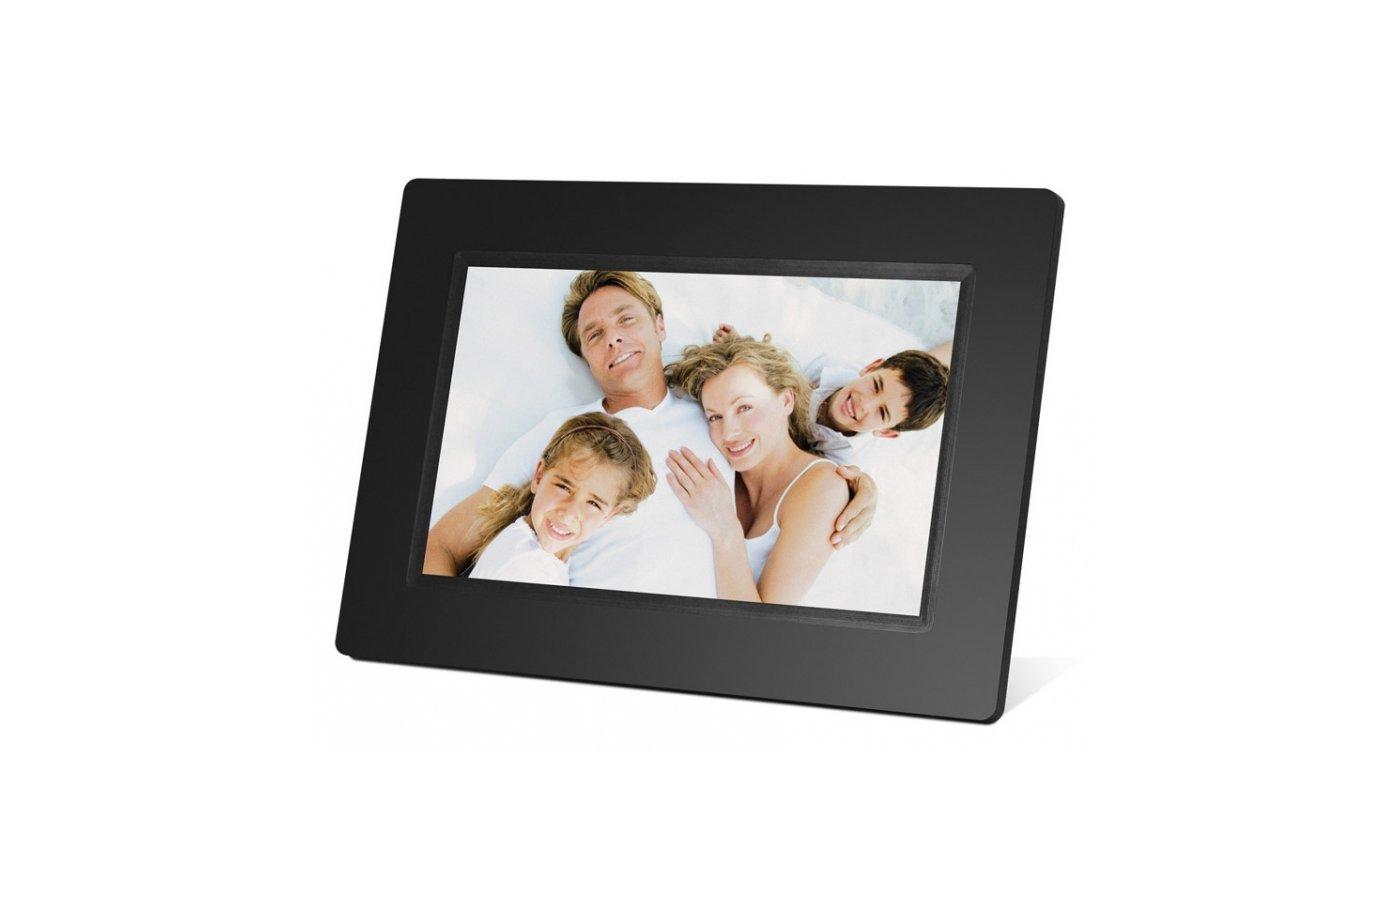 Цифровая фоторамка Digma 7 PF-731 800x480 черный пластик